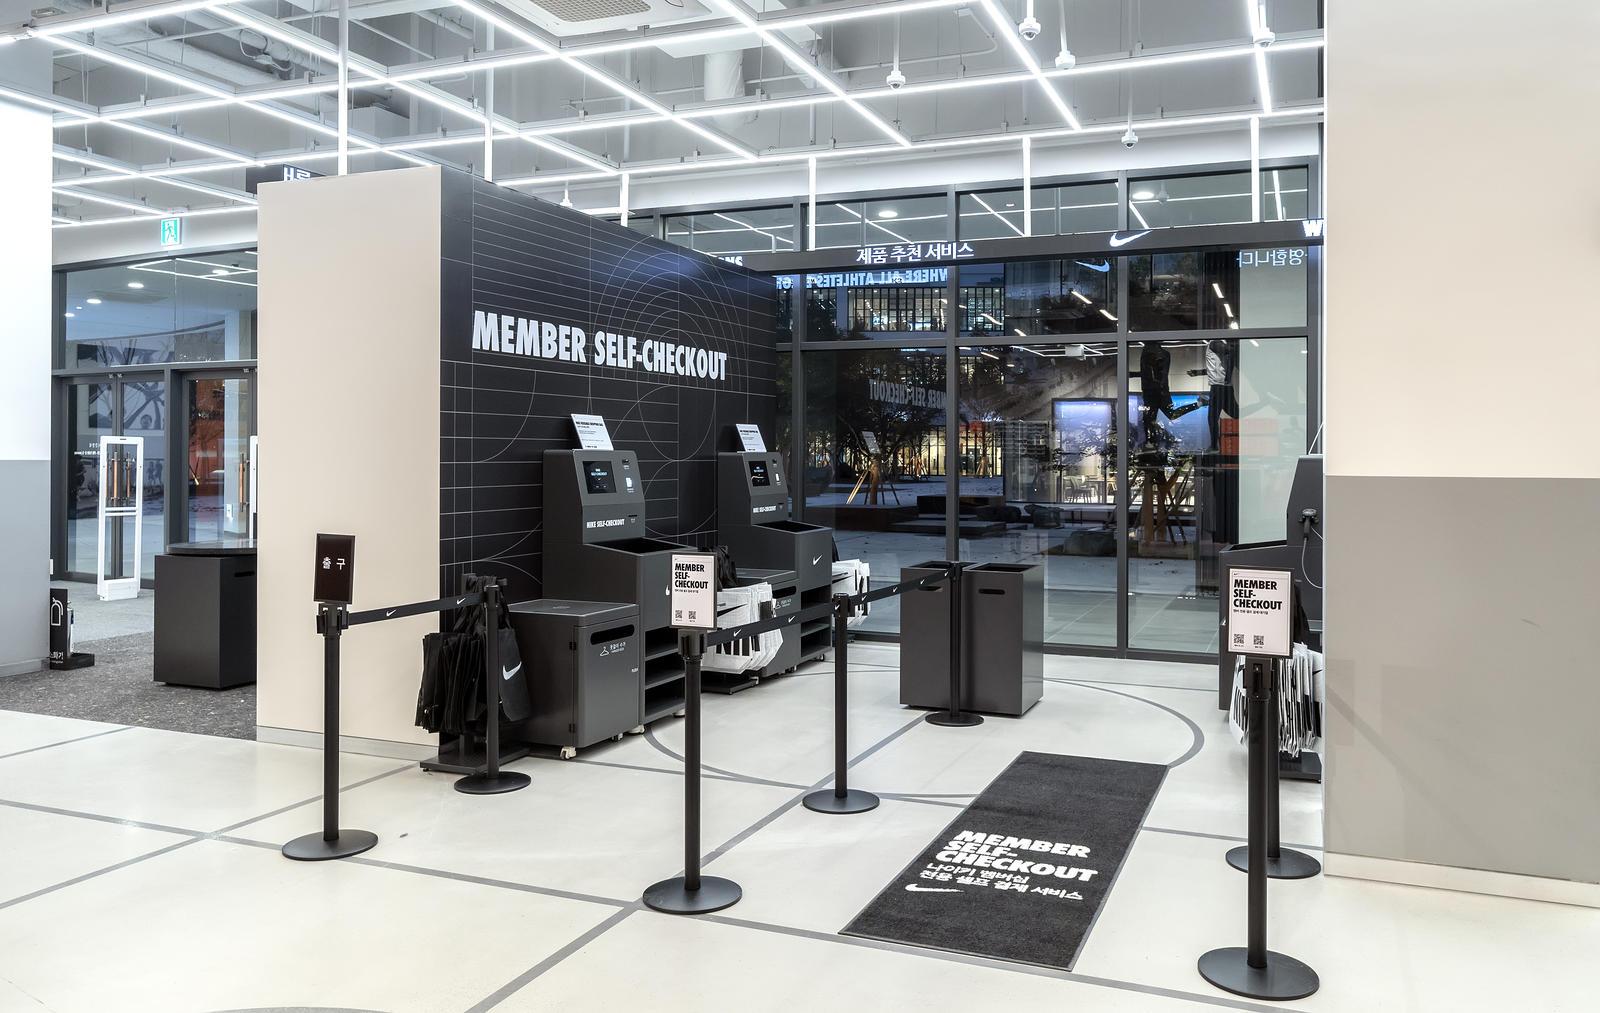 Nike 全新推出第五类零售概念店:Nike Unite,注重密切本地社区联系